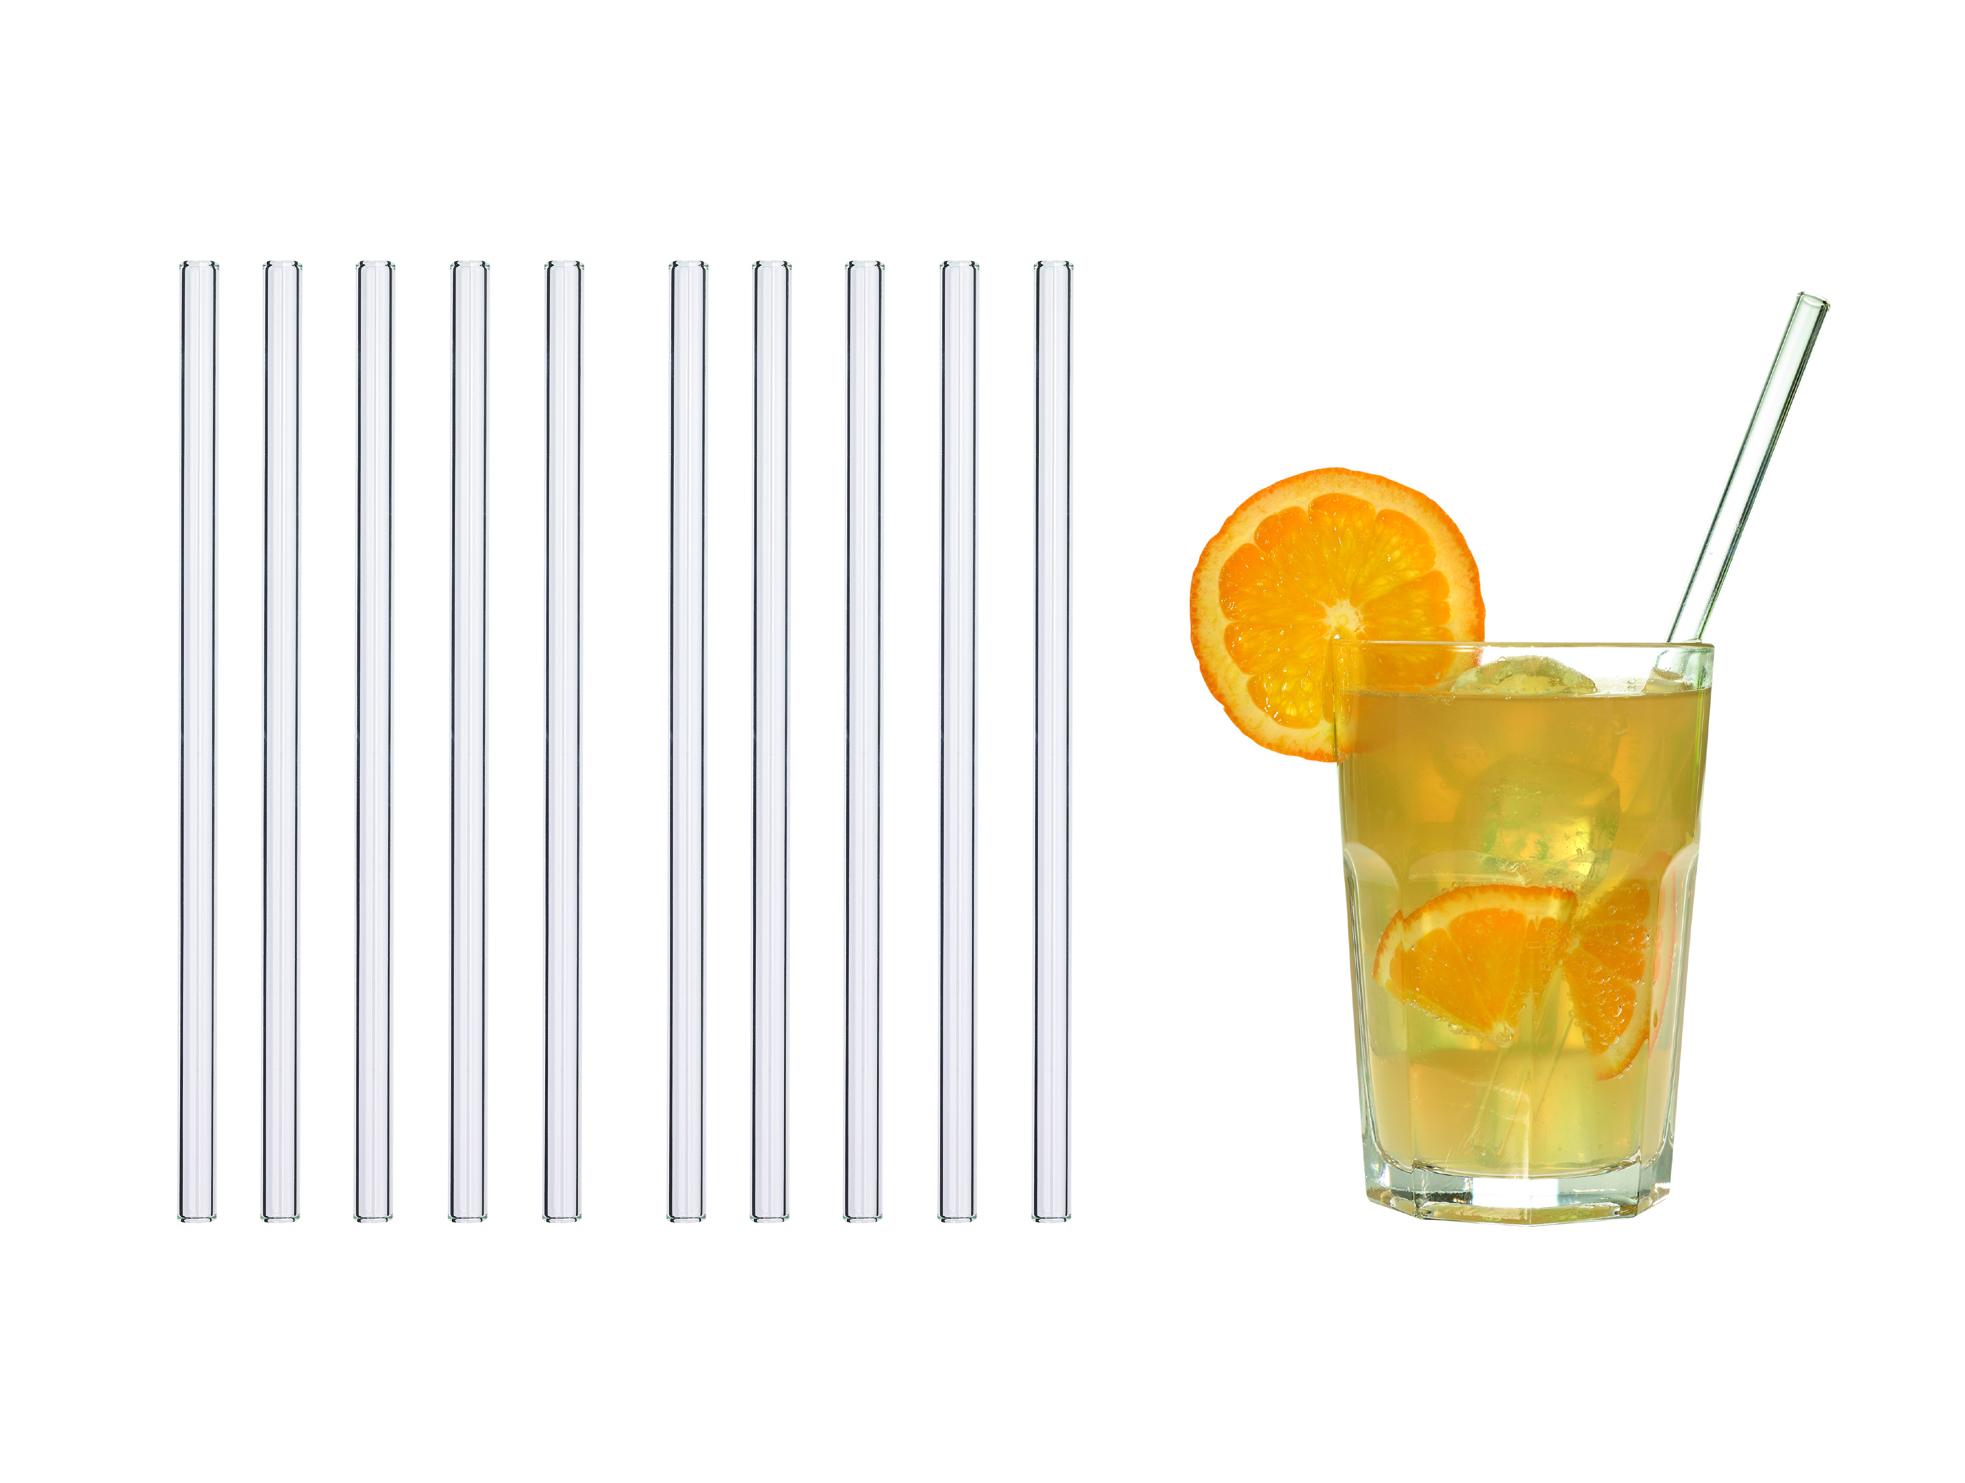 trinkhalme aus glas glaswerk medium tfa dostmann. Black Bedroom Furniture Sets. Home Design Ideas